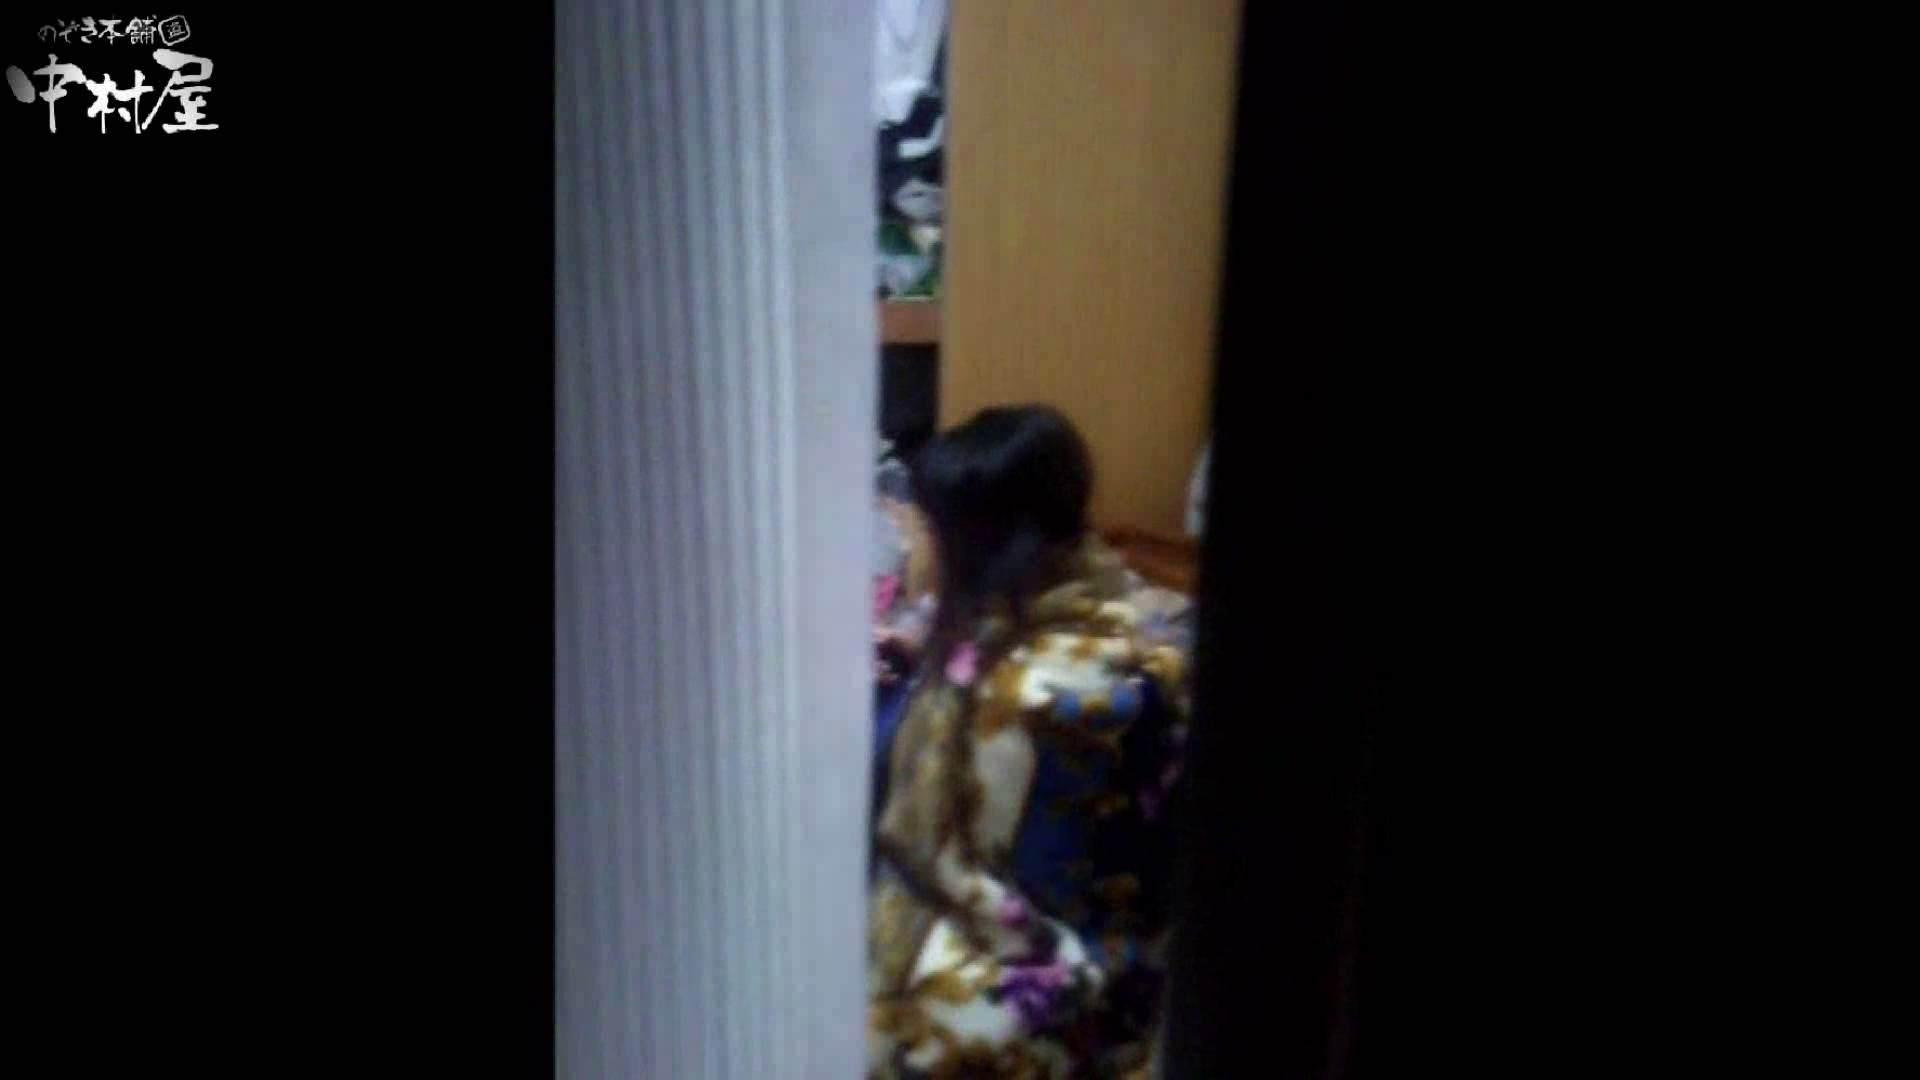 民家風呂専門盗撮師の超危険映像 vol.012 民家シリーズ エロ無料画像 89PIX 83